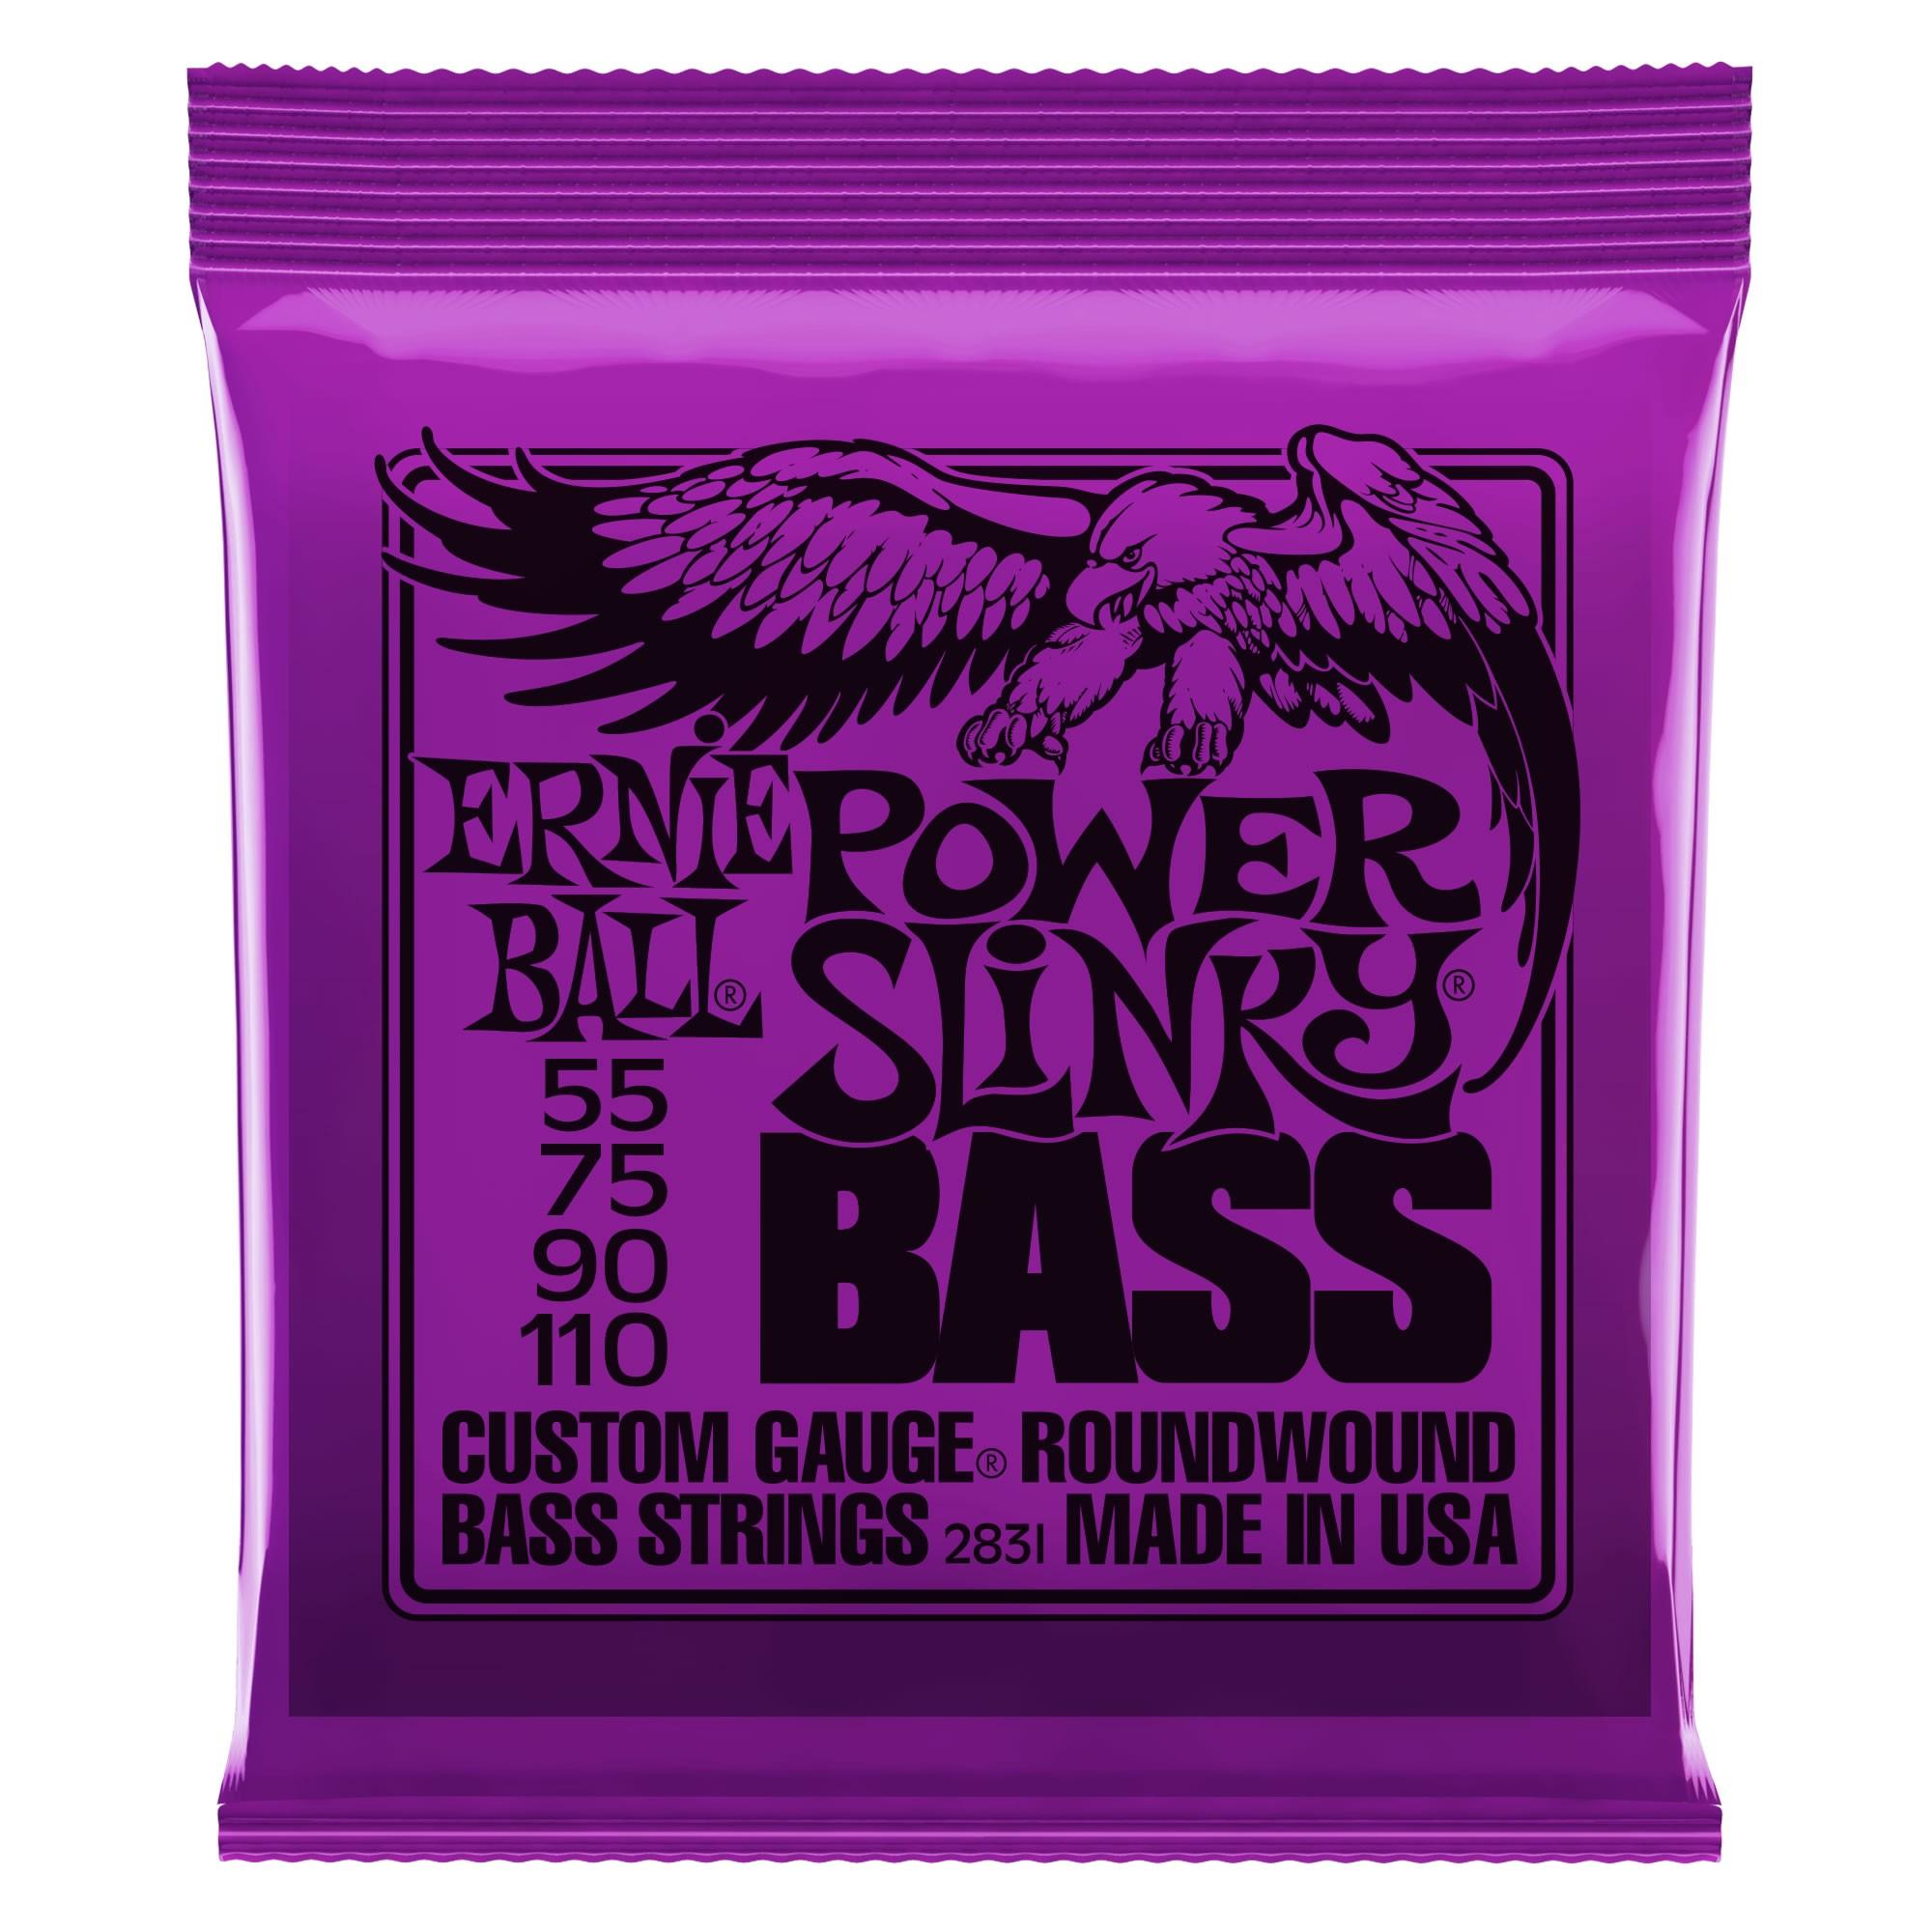 ernie ballslinky nickel wound electric bass strings best bass gear. Black Bedroom Furniture Sets. Home Design Ideas